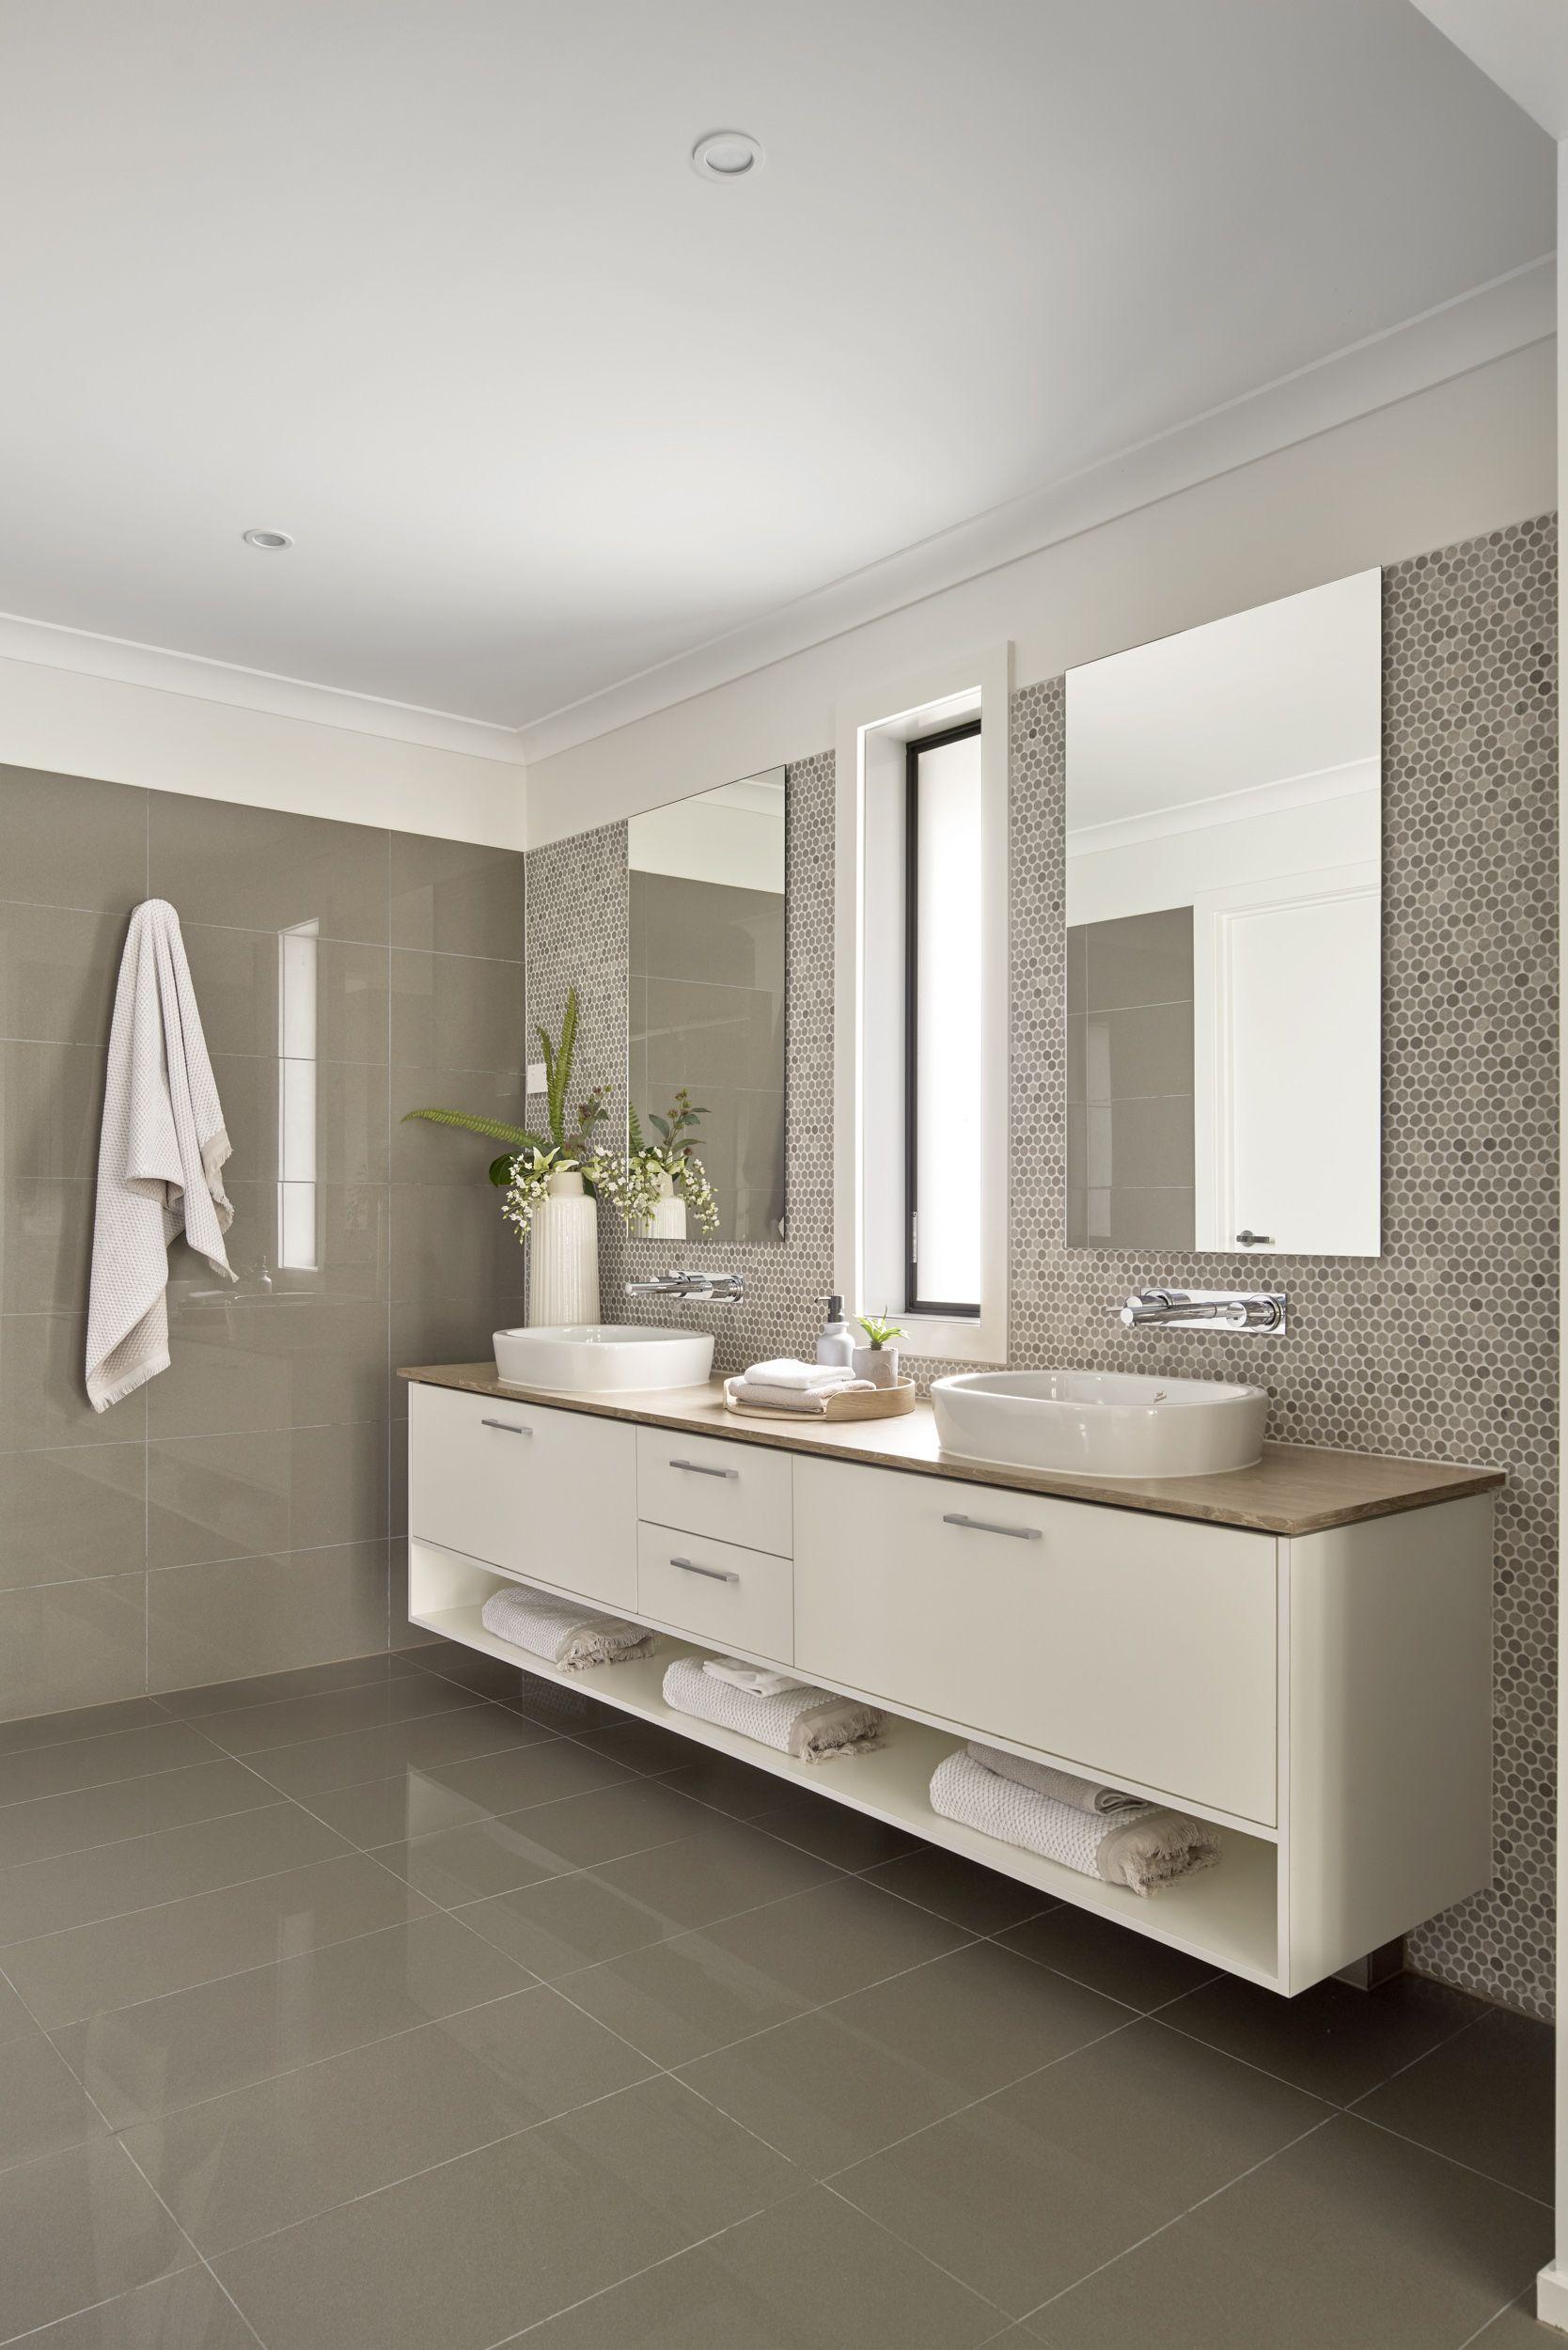 A Large Double Vanity With An Abundance Of Storage For The Salamanca Bathroom On Display In Ka In 2020 Double Vanity Bathroom Bathroom Vanity Designs Bathroom Vanity